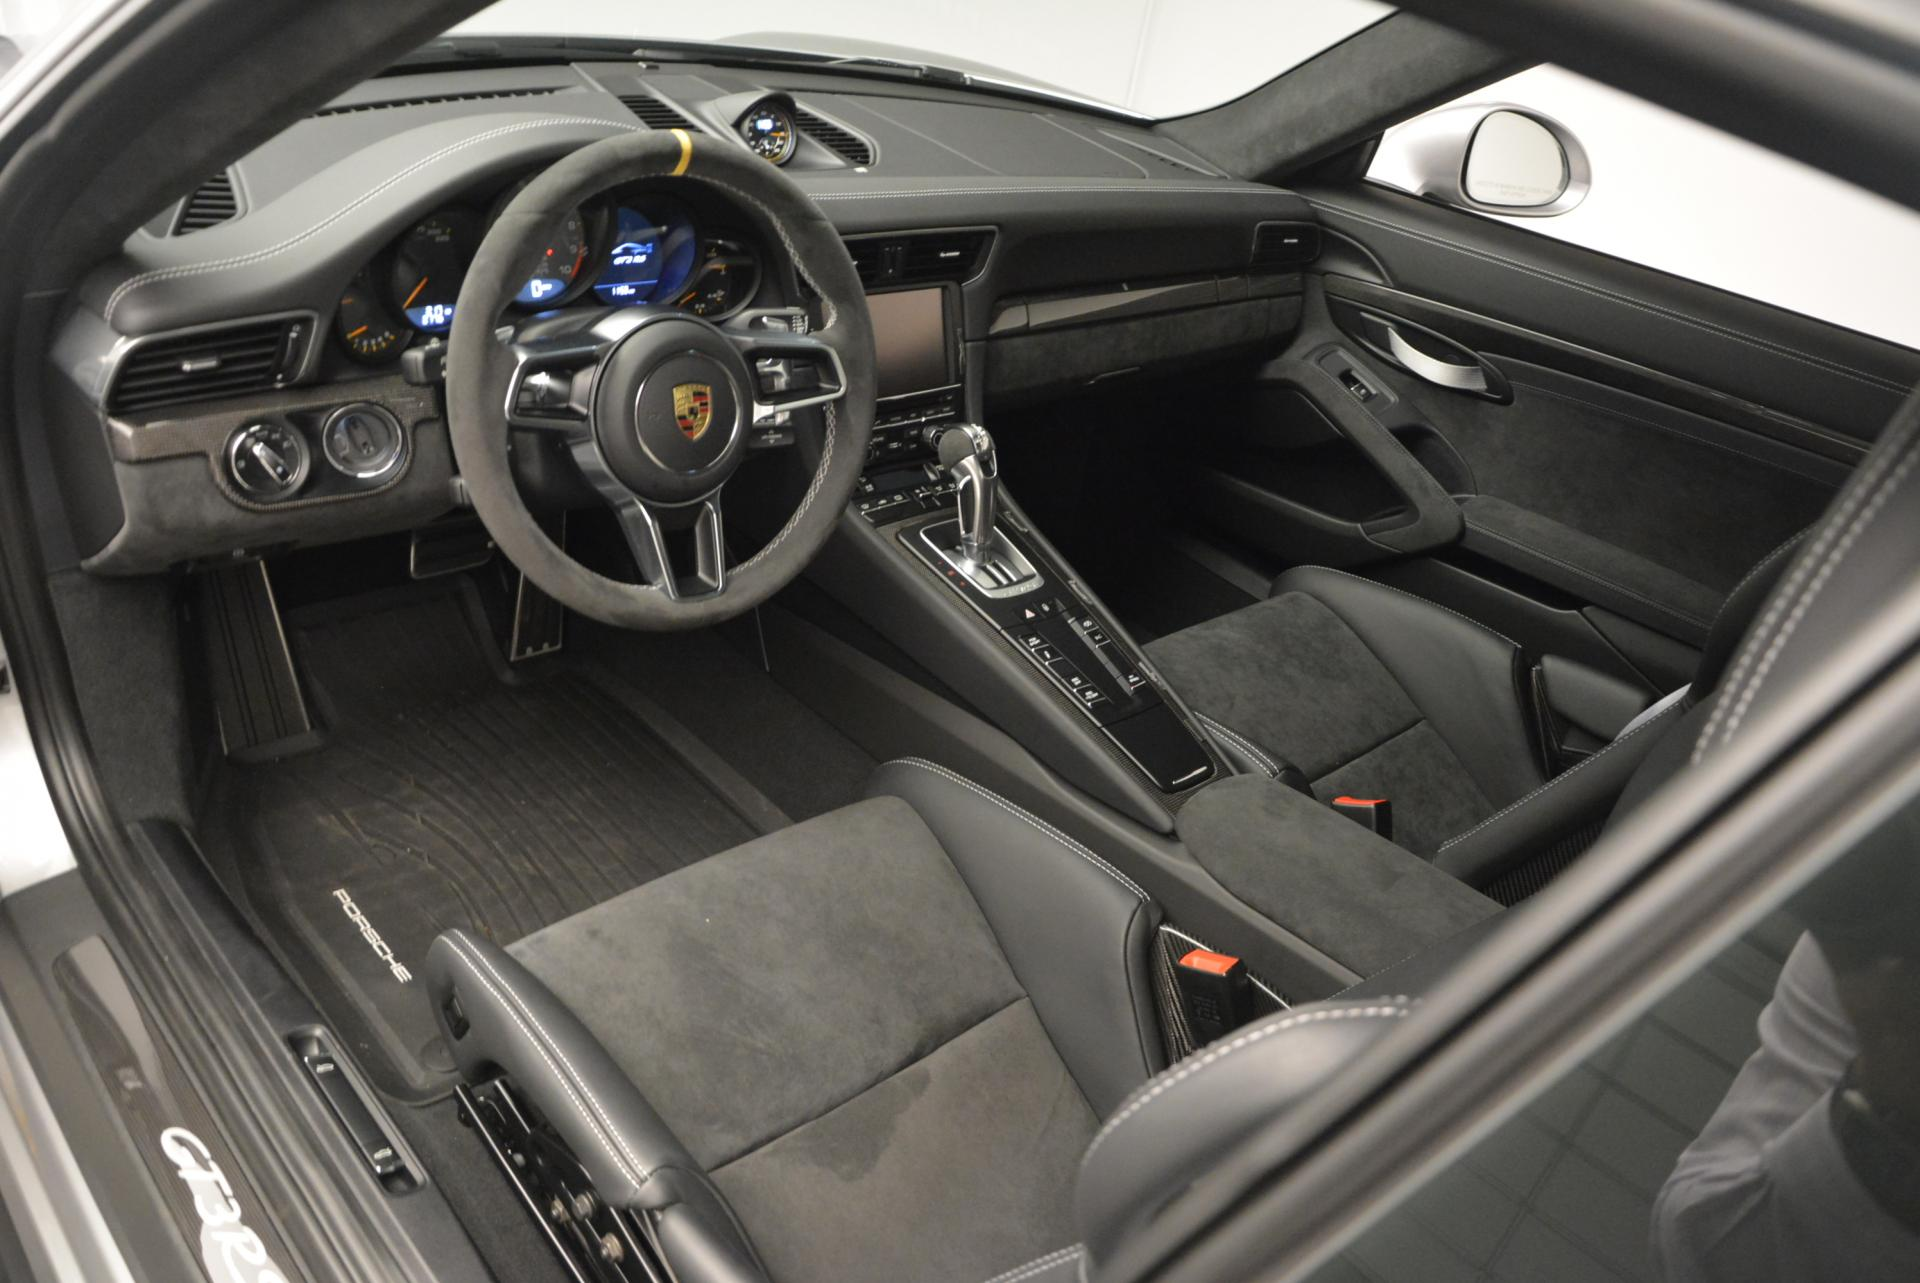 Used 2016 Porsche 911 GT3 RS For Sale In Westport, CT 112_p13